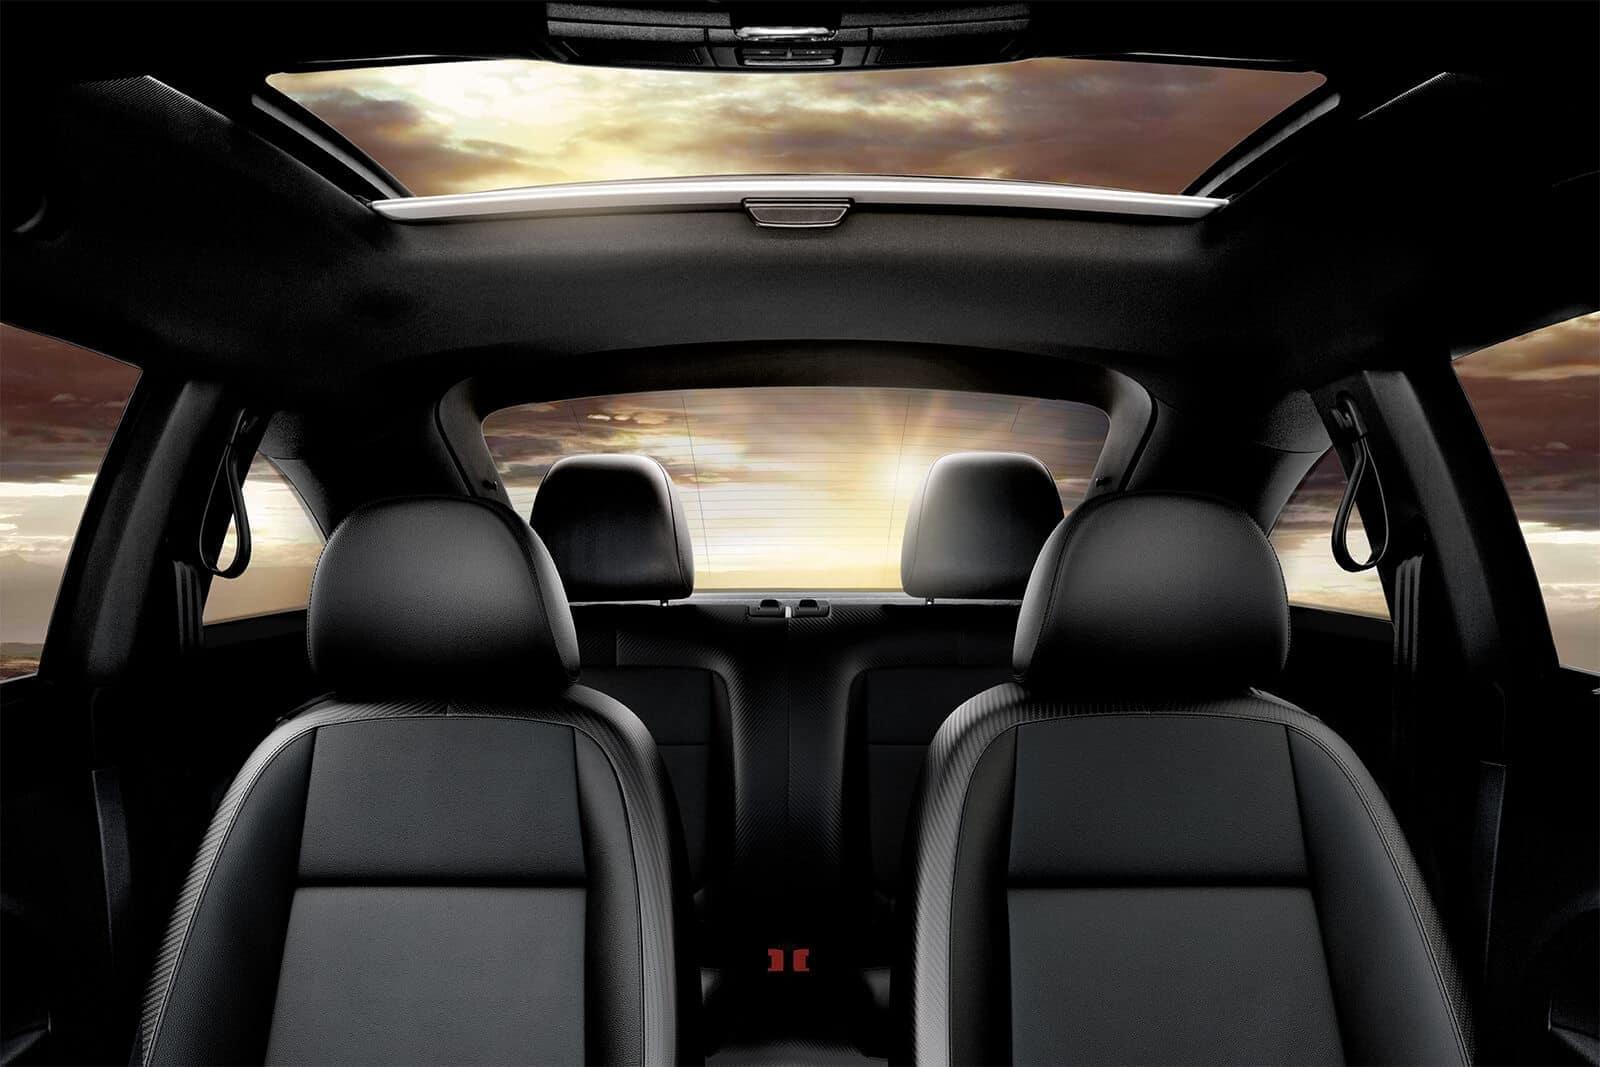 2019 Volkswagen Beetle interior in black leatherette